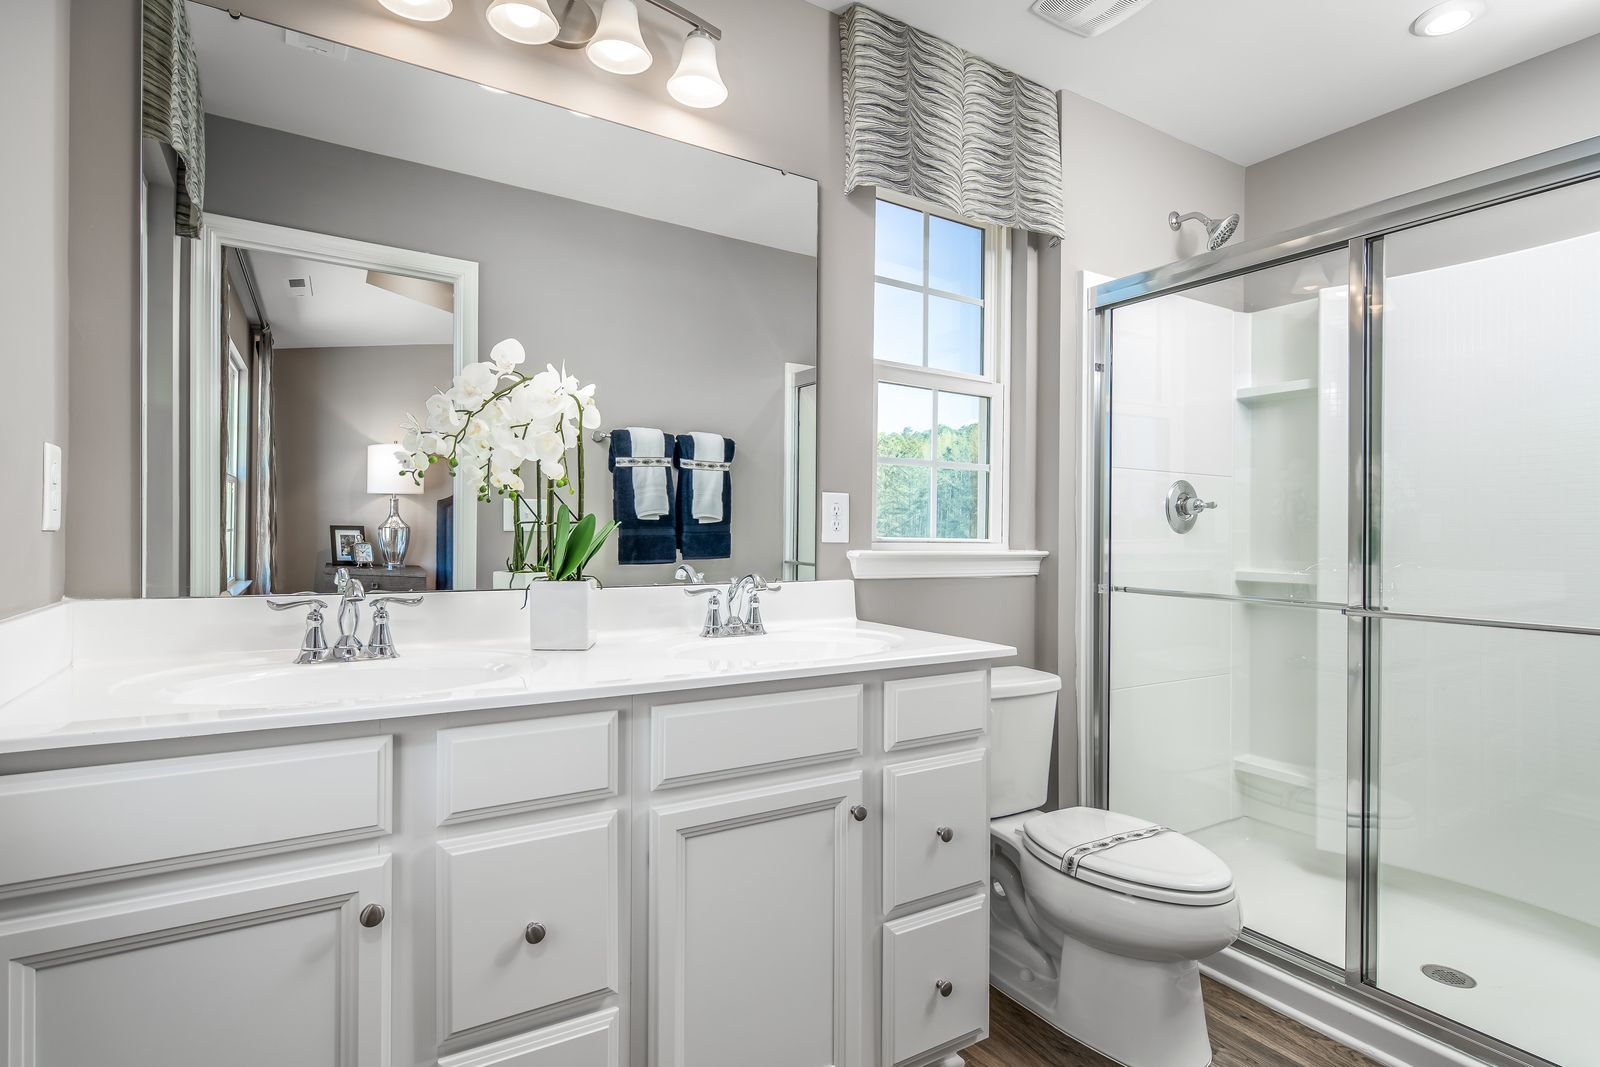 Bathroom featured in the Mozart By Ryan Homes in Philadelphia, NJ